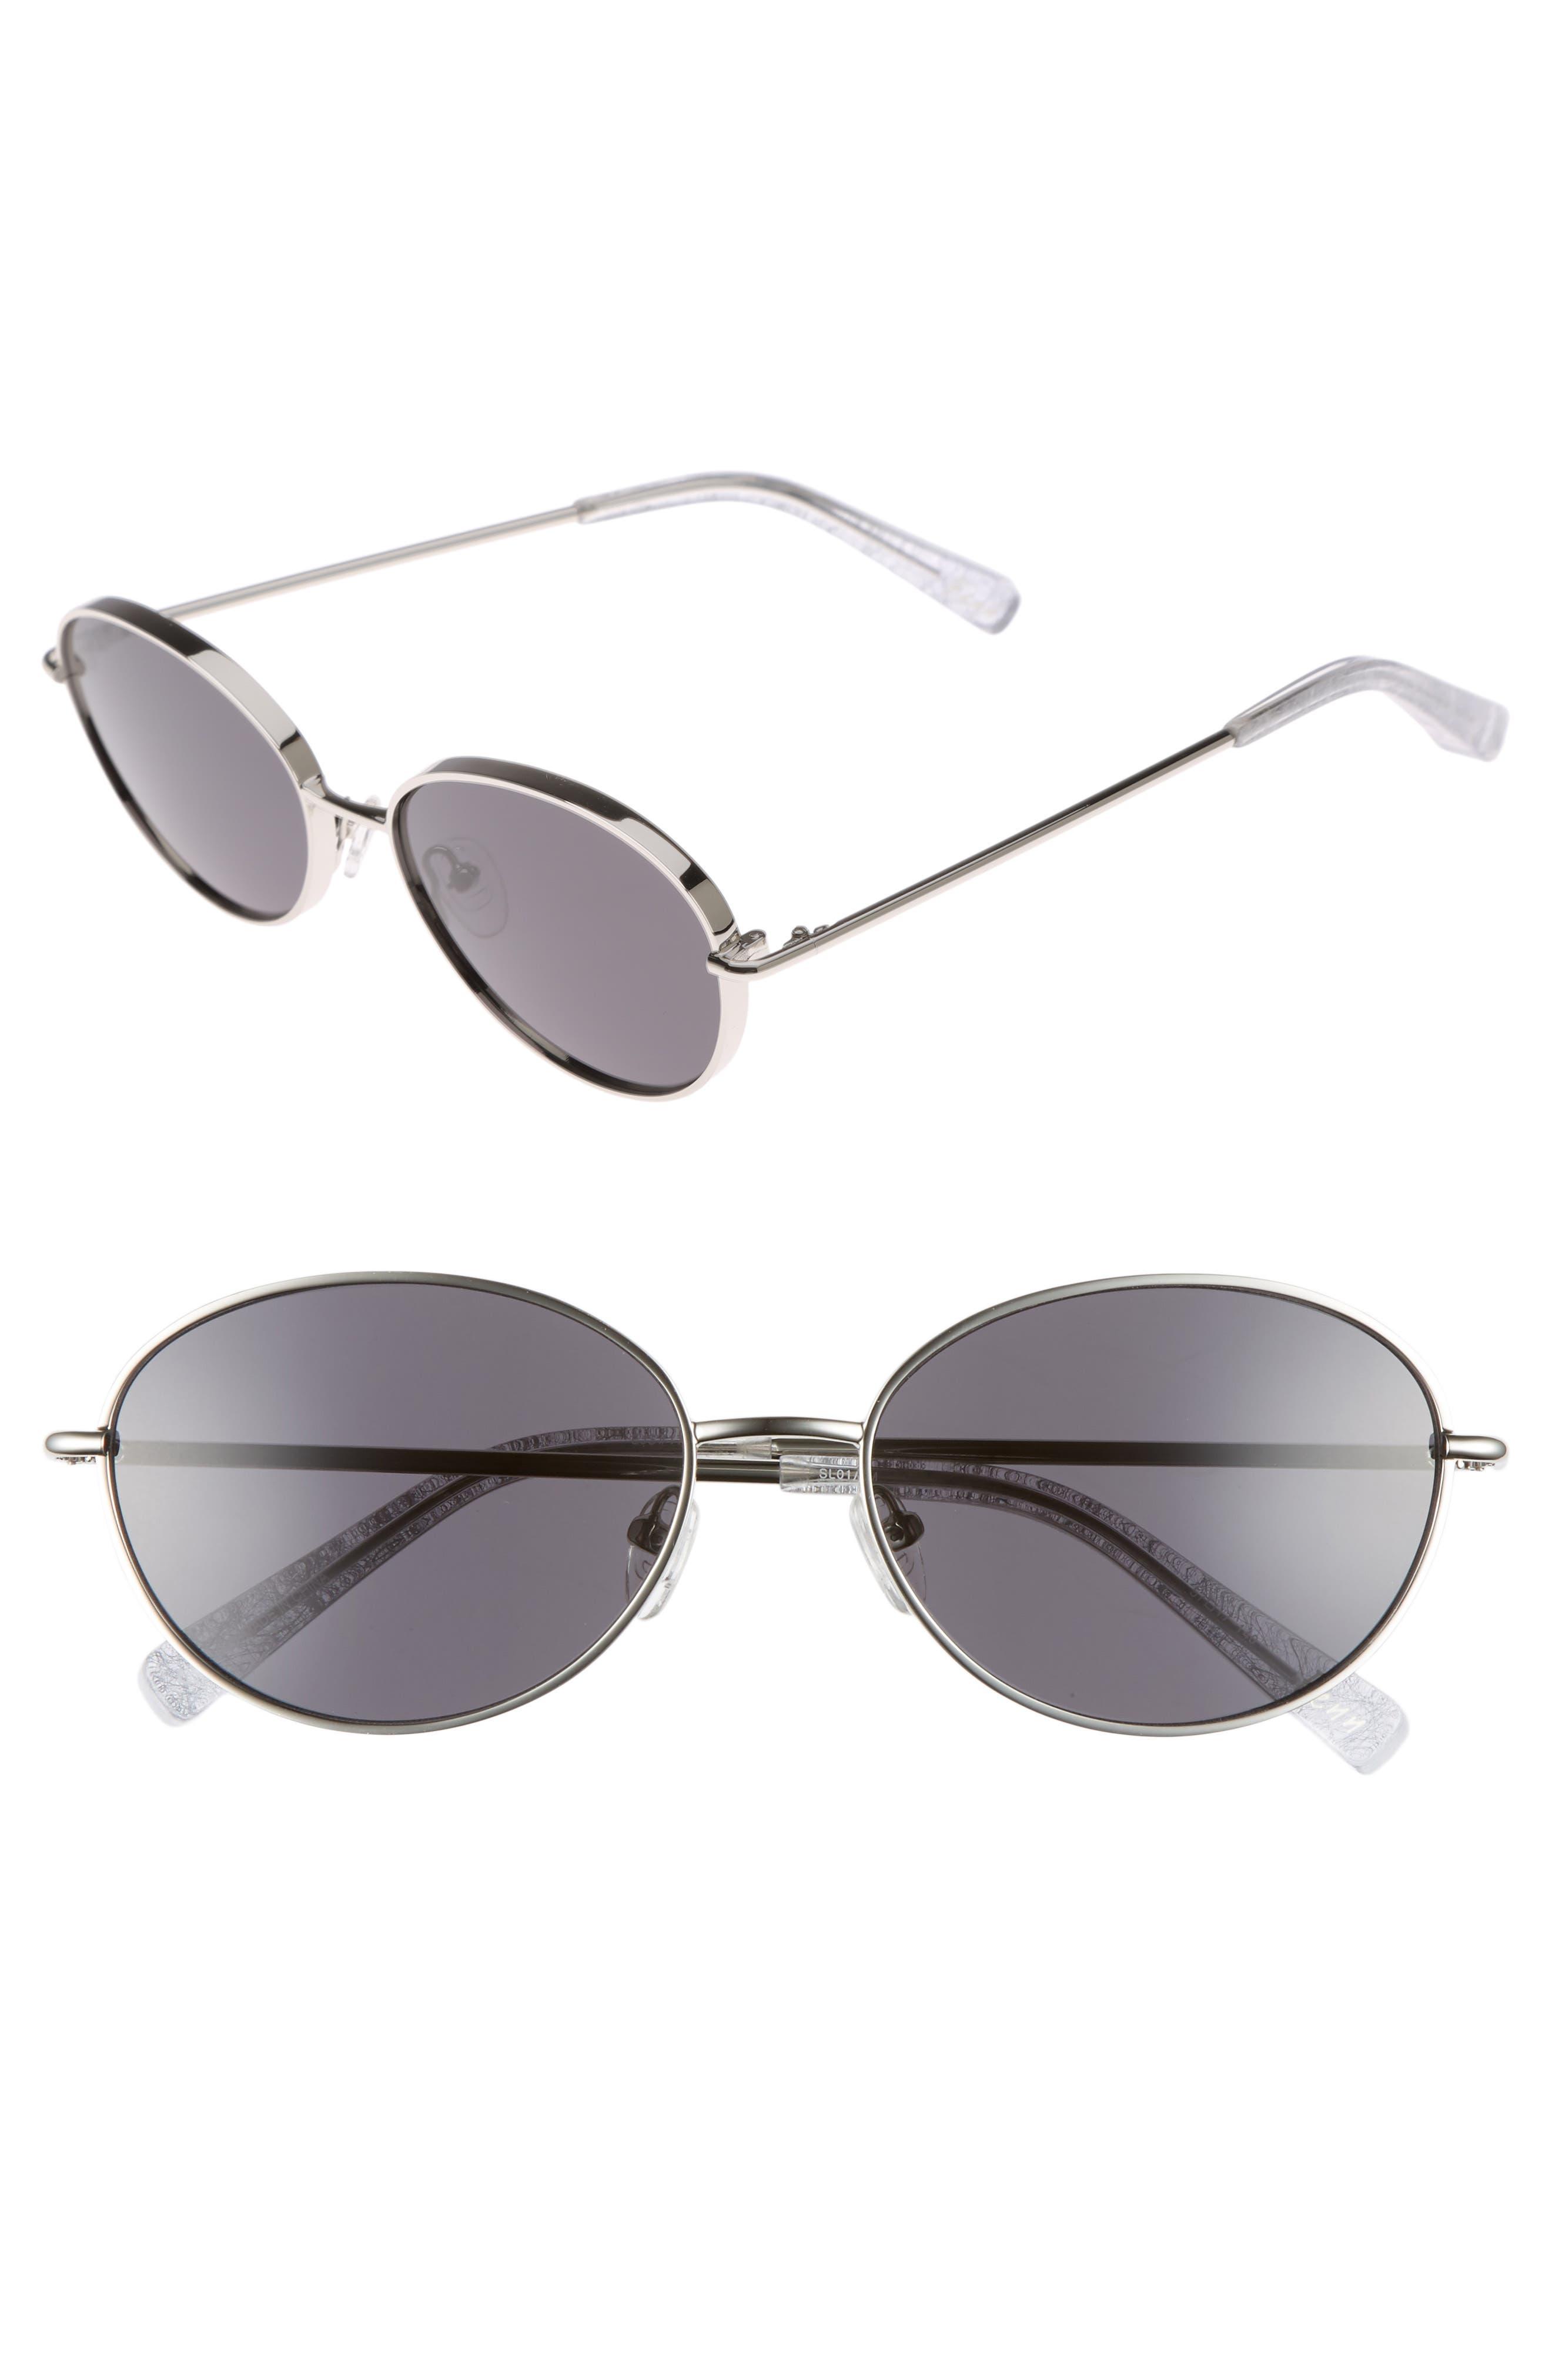 Main Image - Elizabeth and James Fenn 57mm Oval Sunglasses